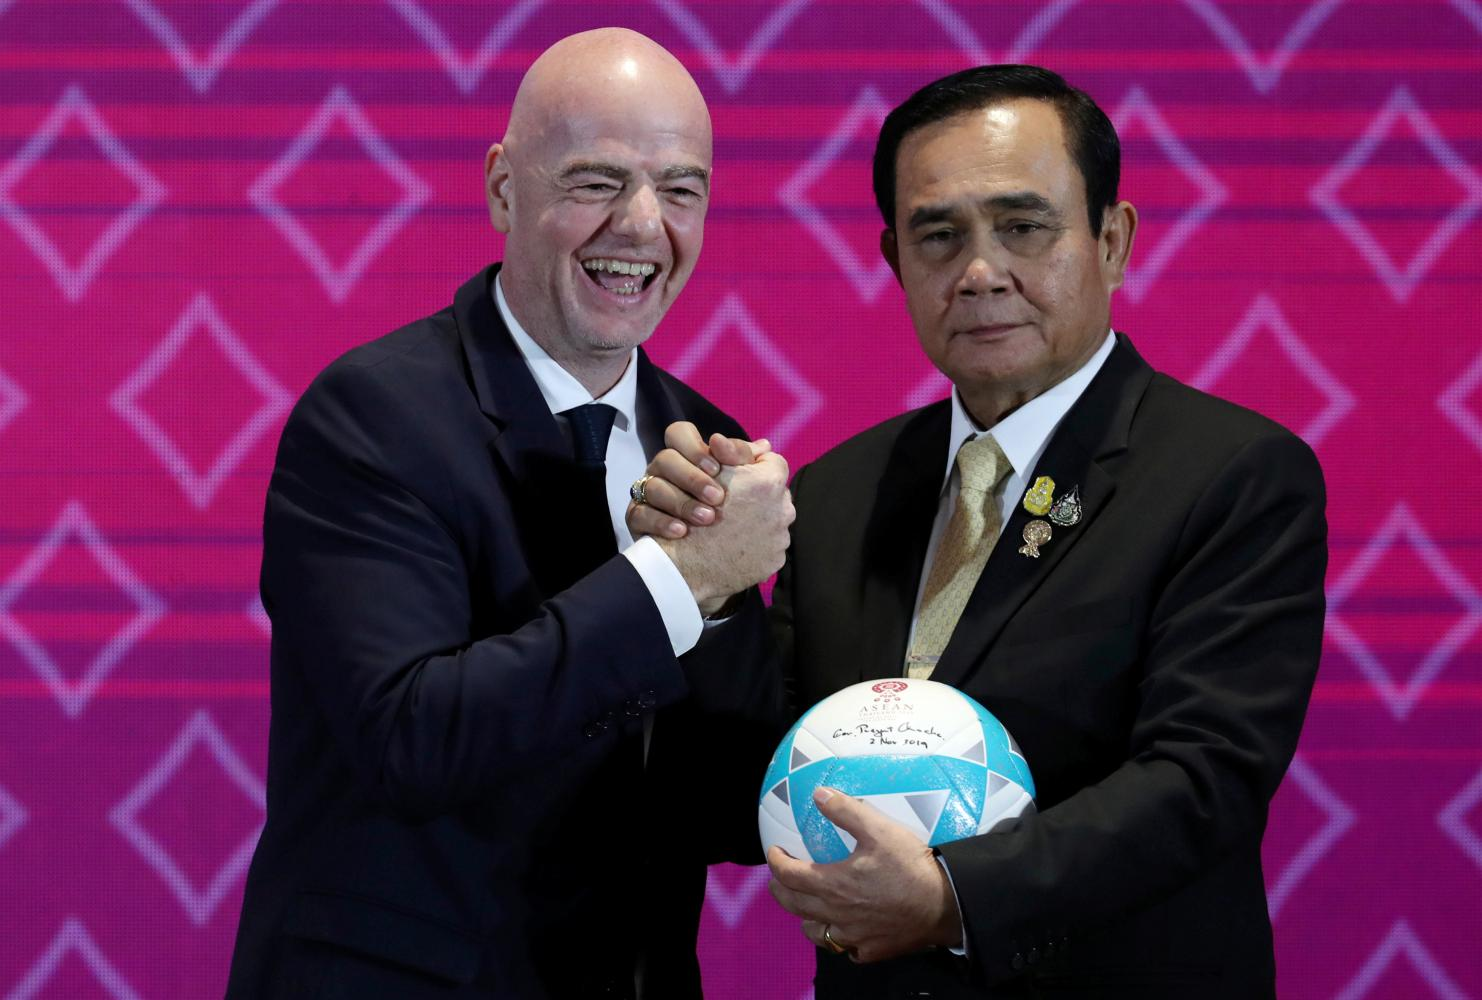 Prayut: 'I plead with everyone'